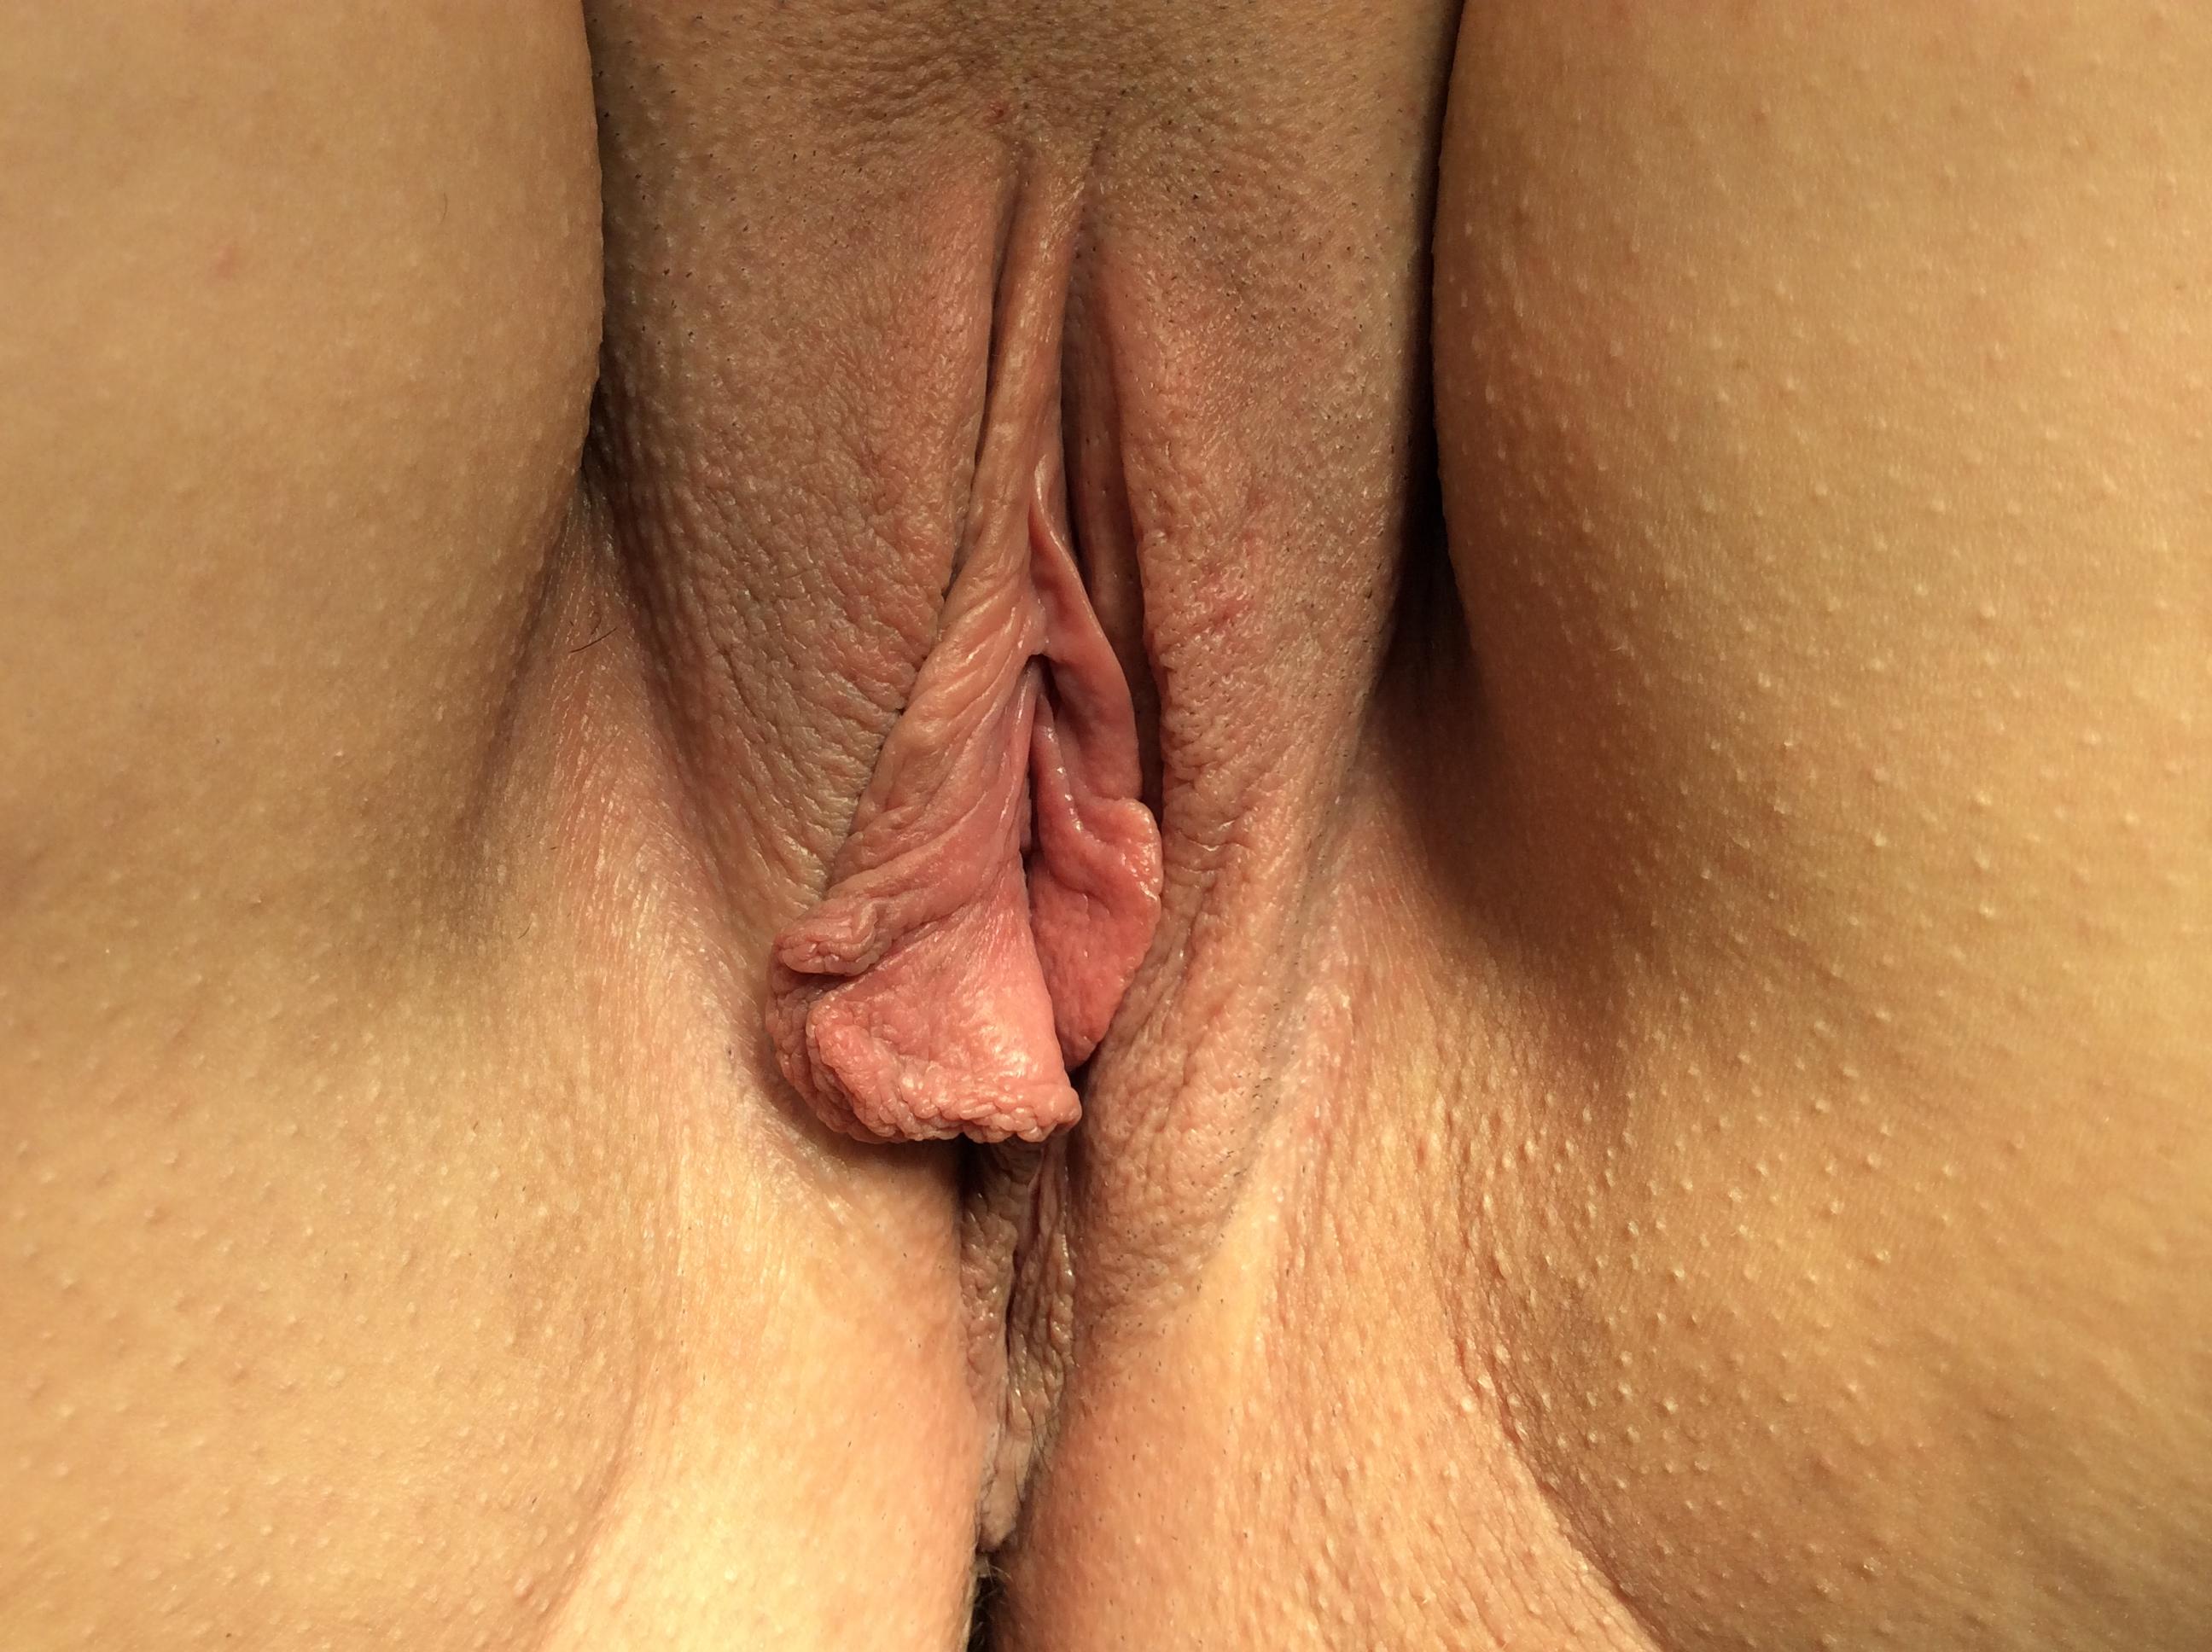 Pre Labiaplasty